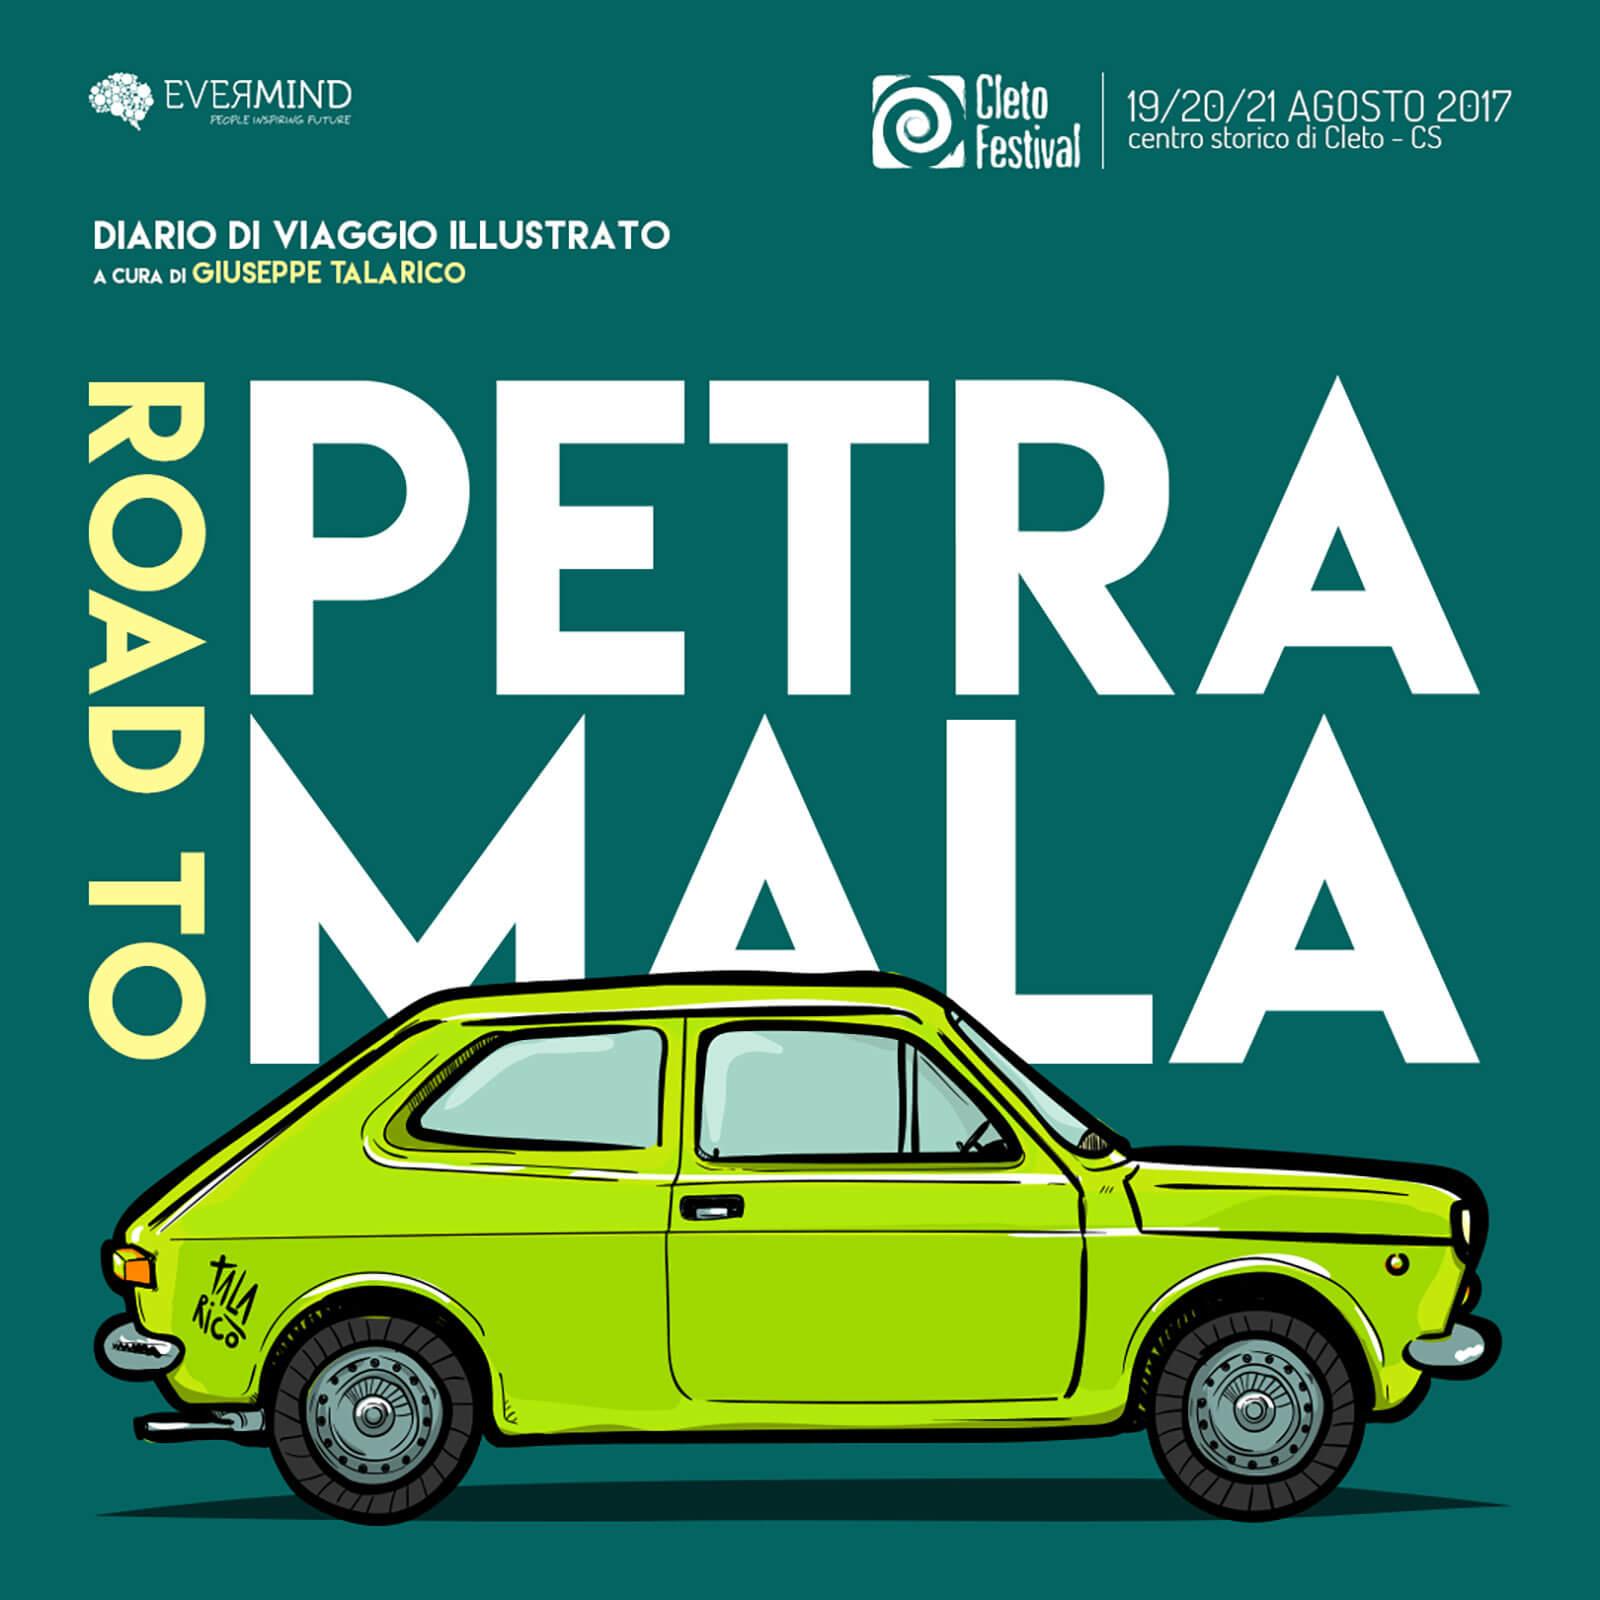 Road to Petramala